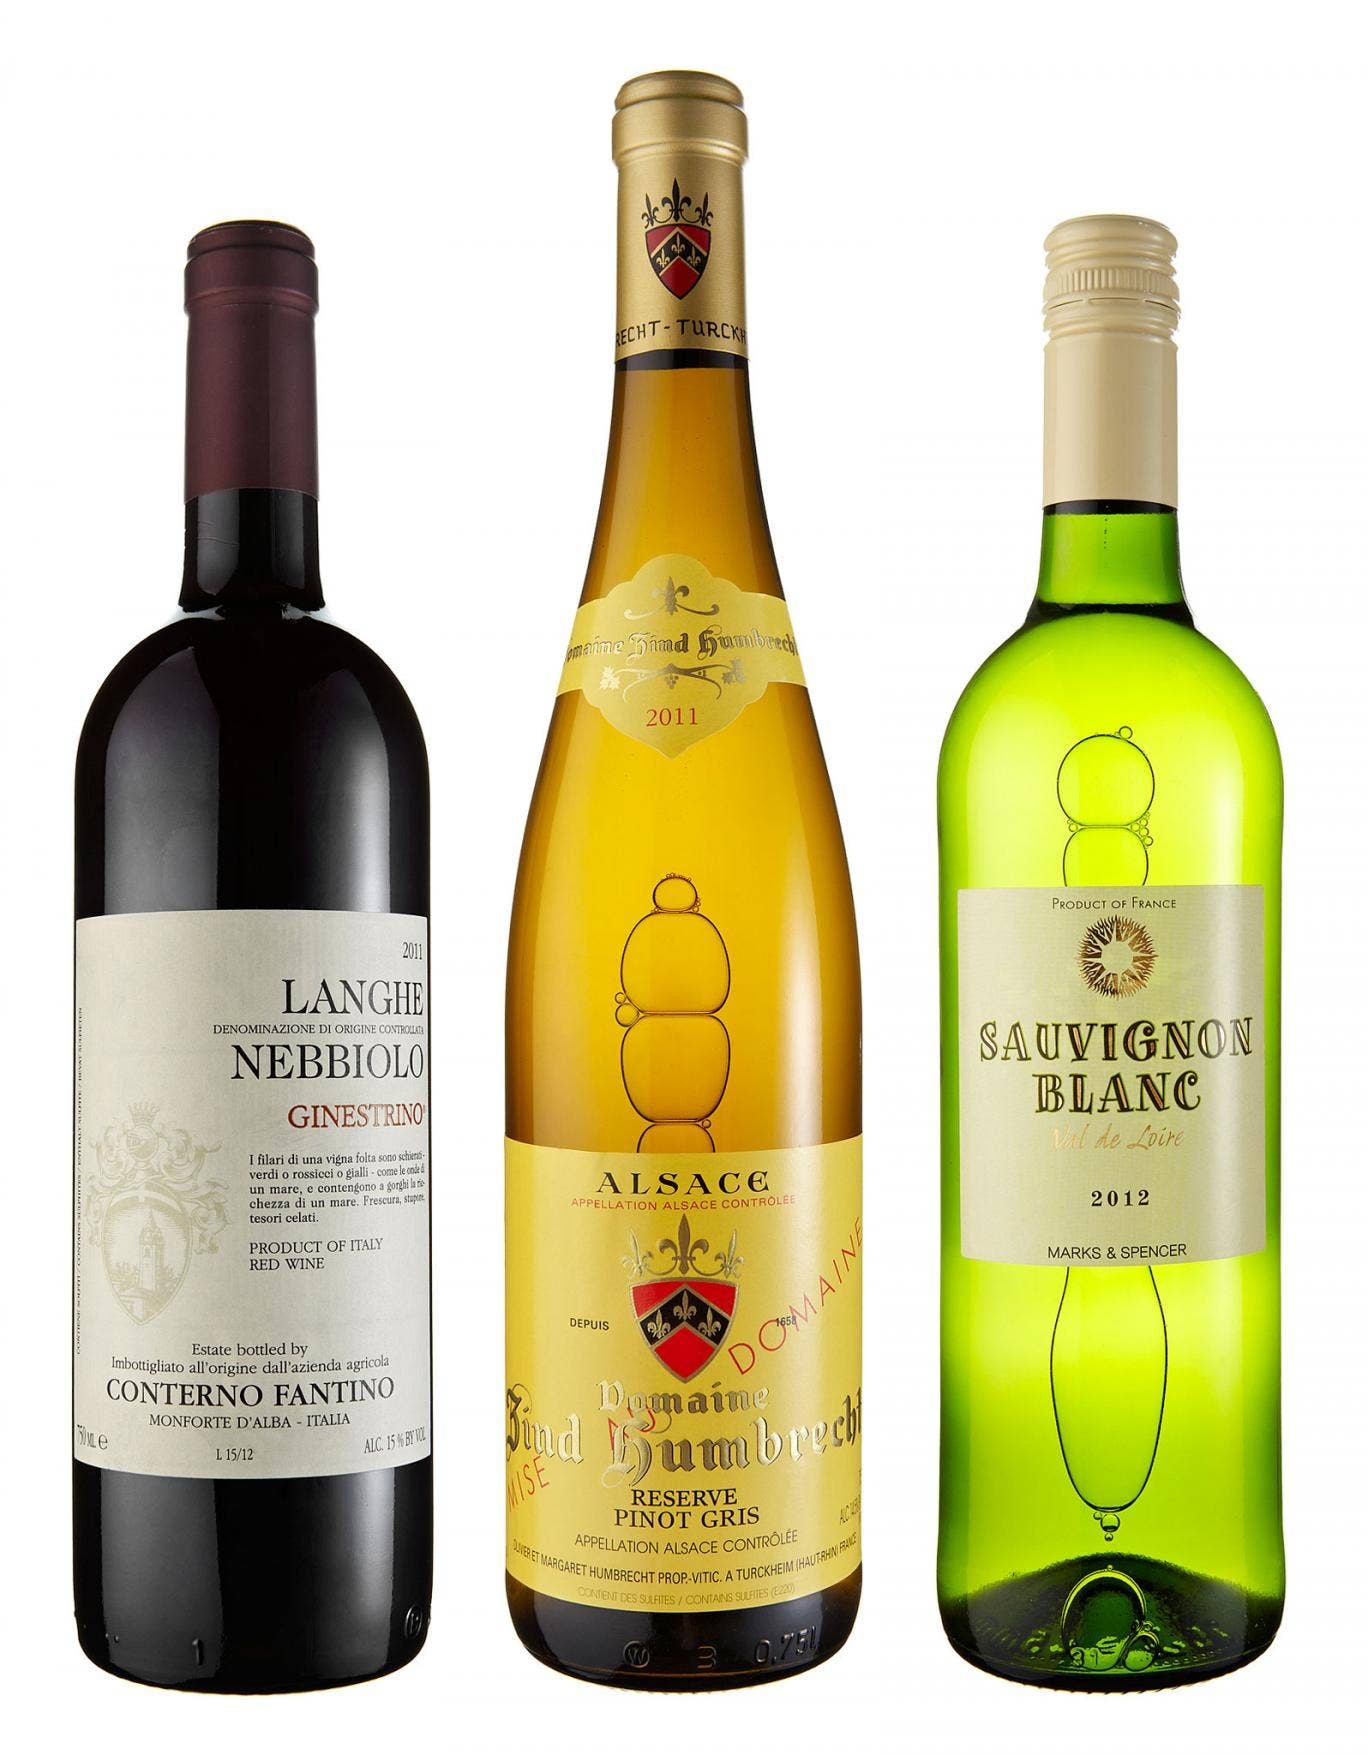 2012 Sauvignon Blanc, Vin de Pays du Val de Loire; 2011 Zind Humbrecht Reserve Pinot Gris; 2011 Conterno Fantino Langhe Nebbiolo Ginestrino, Langhe